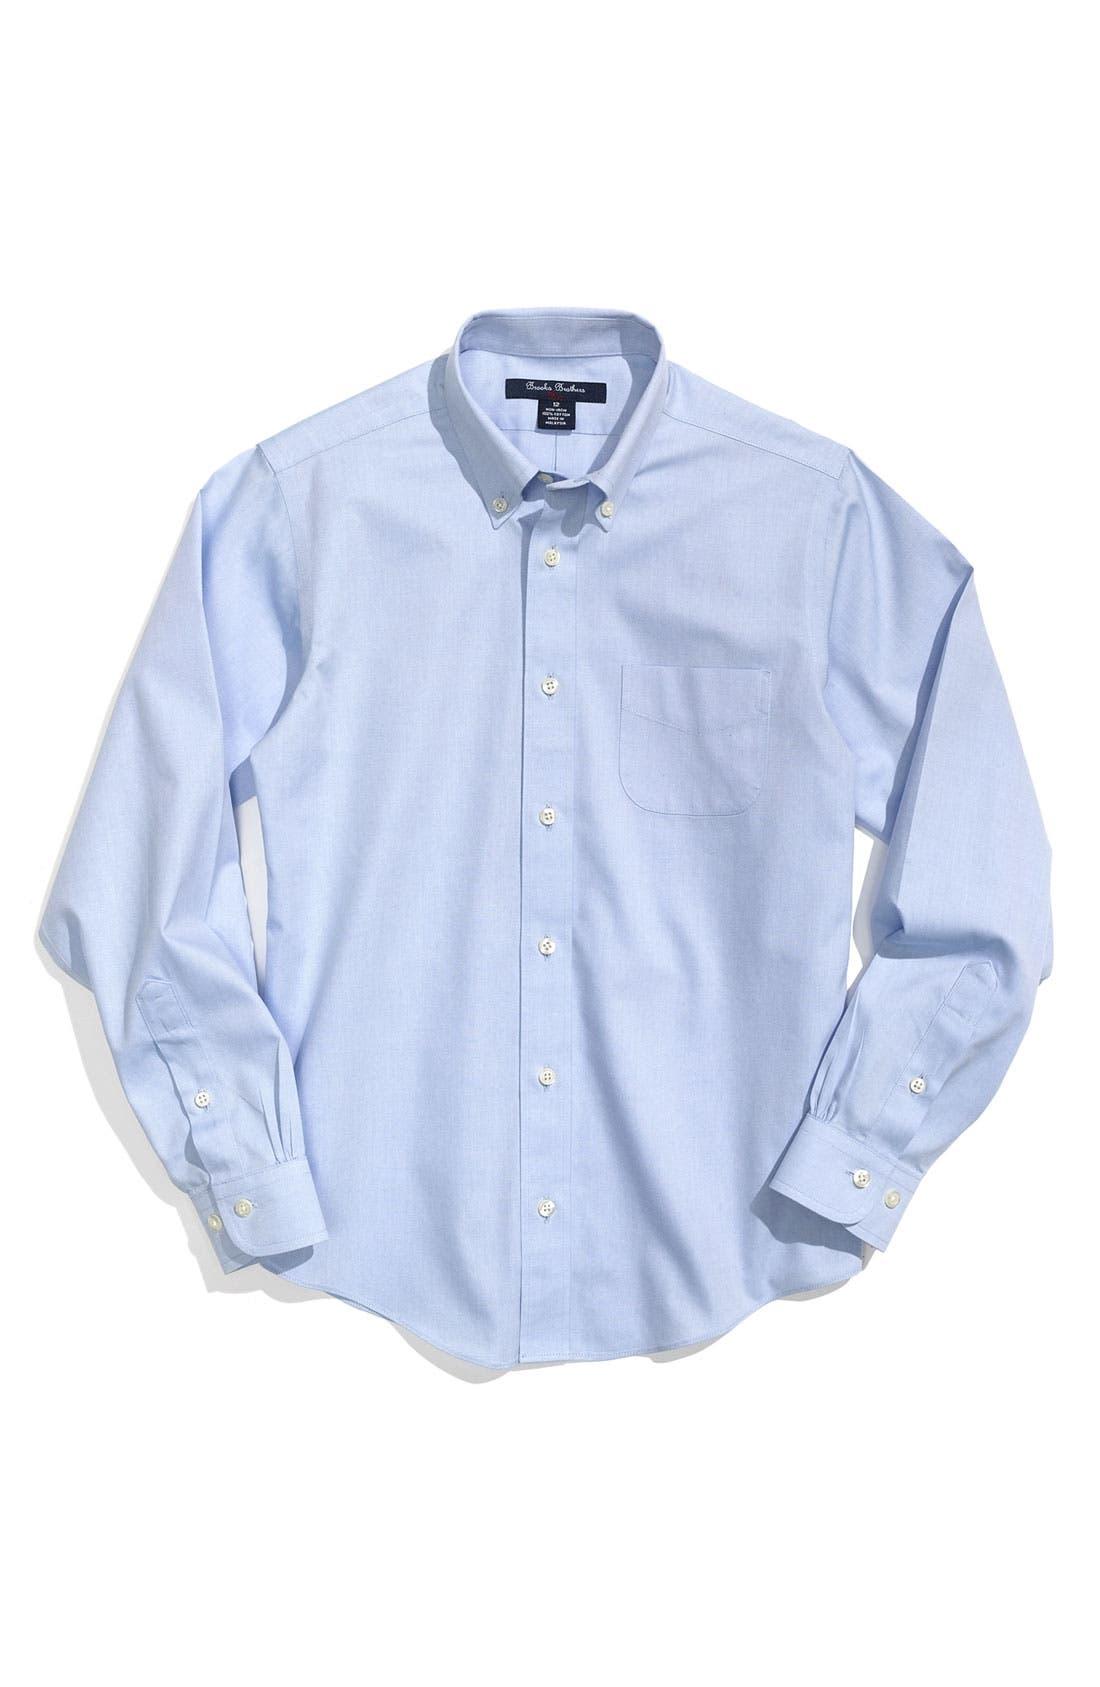 Alternate Image 1 Selected - Brooks Brothers Dress Shirt (Big Boys)